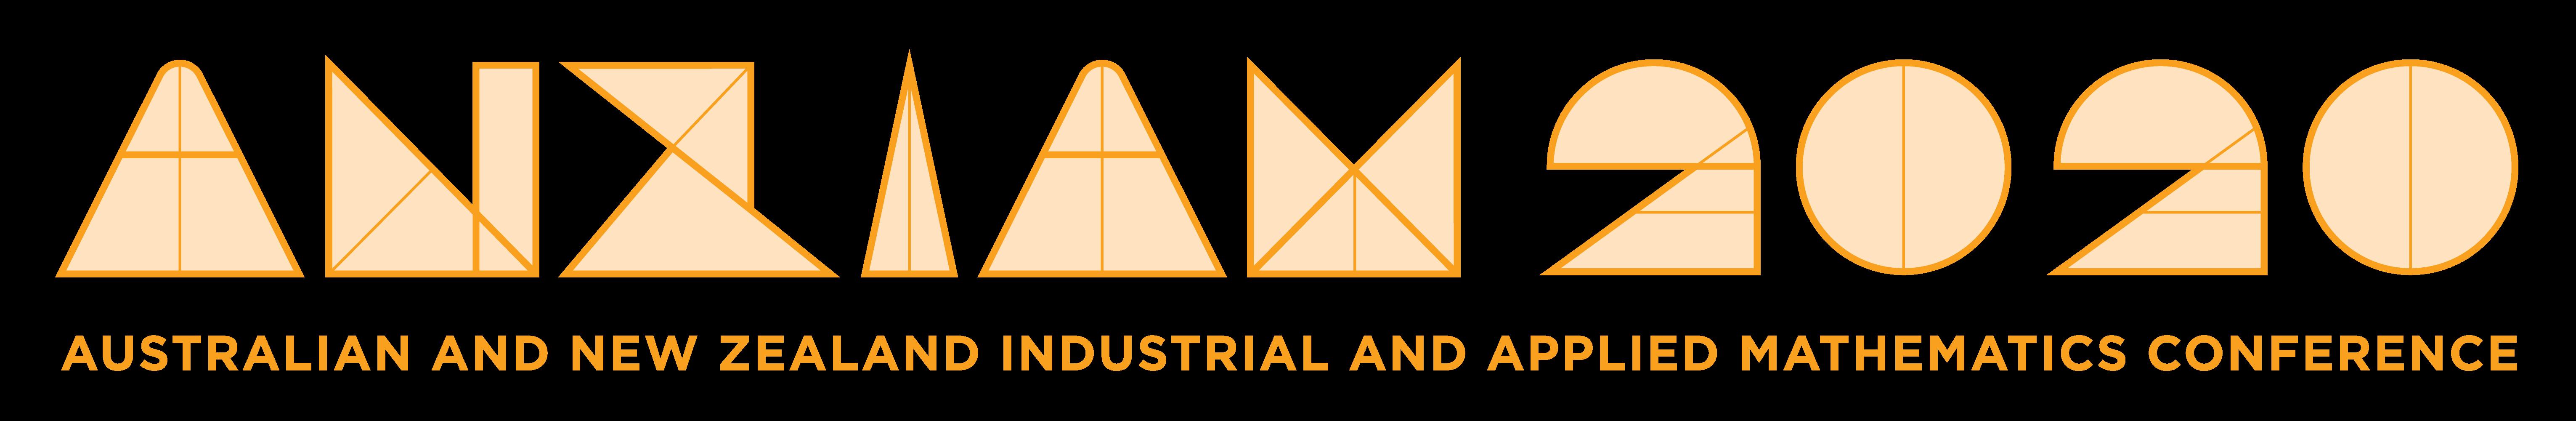 ANZIAM 2020 logo